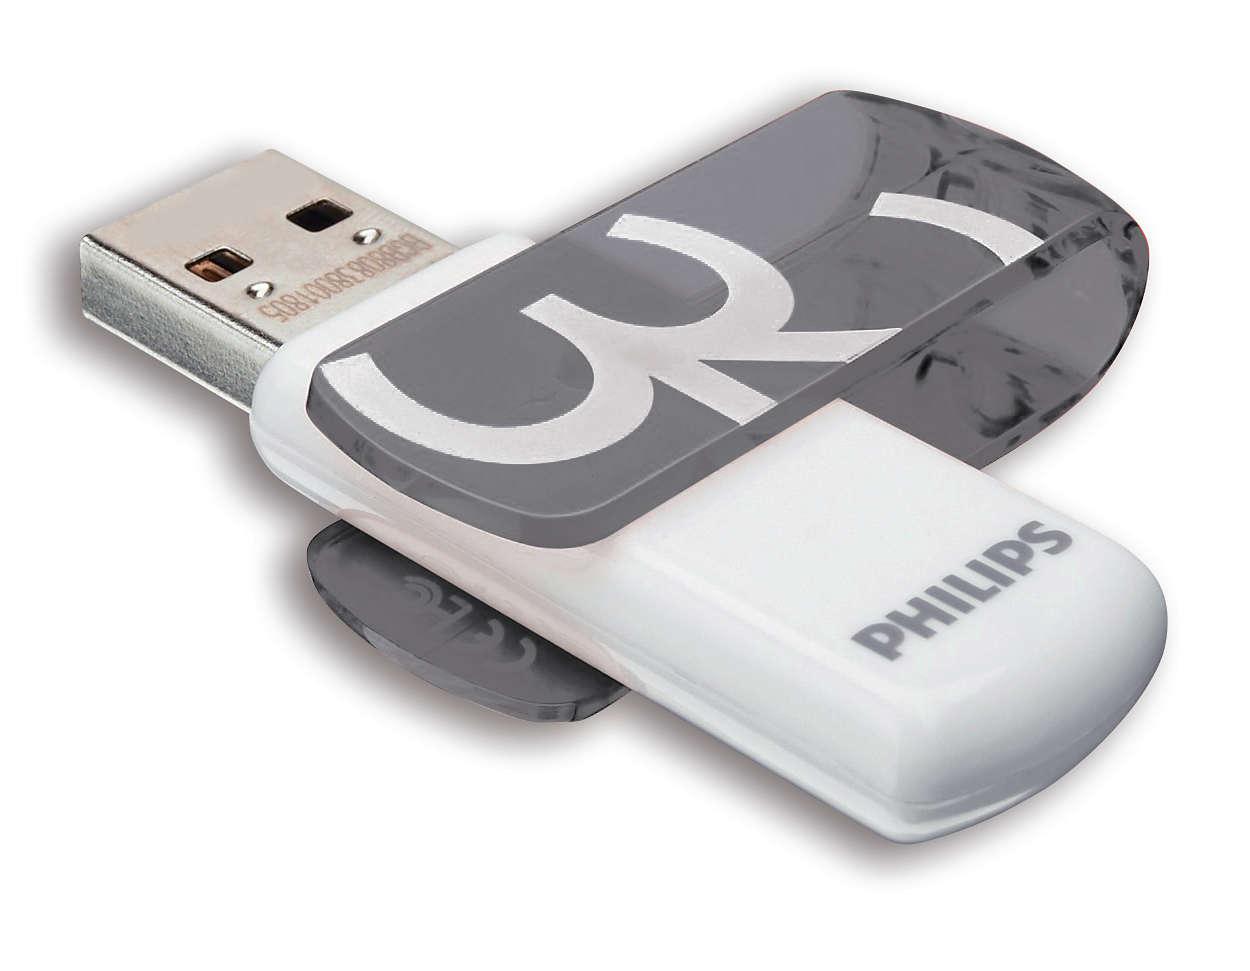 Estrema facilità d'uso, plug and play